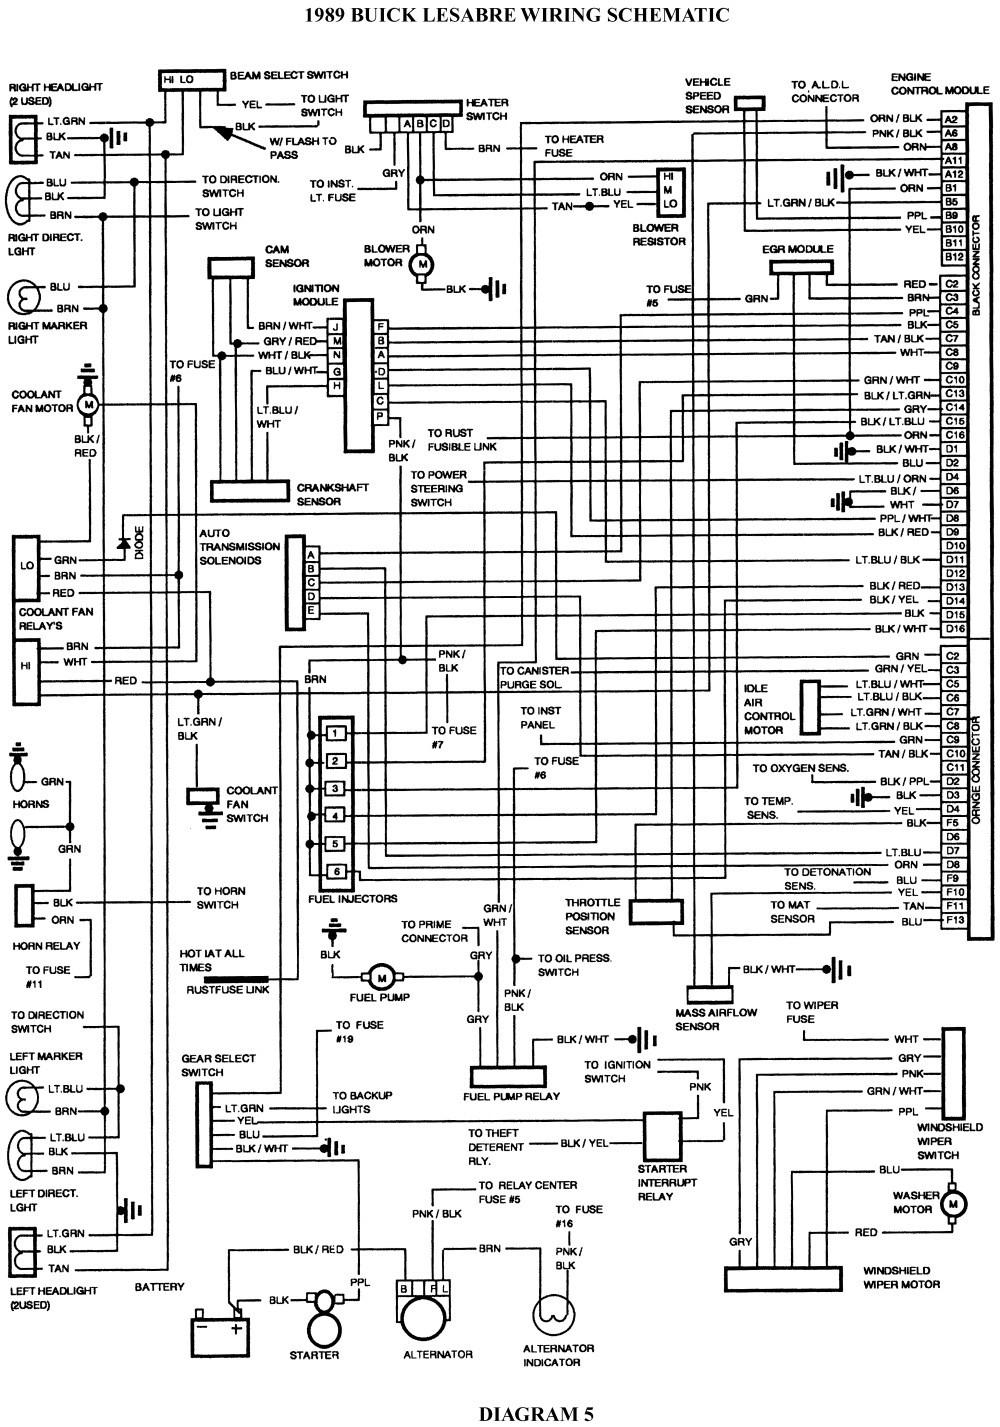 2001 Buick Century Stereo Wiring Diagram Free Wiring Diagram